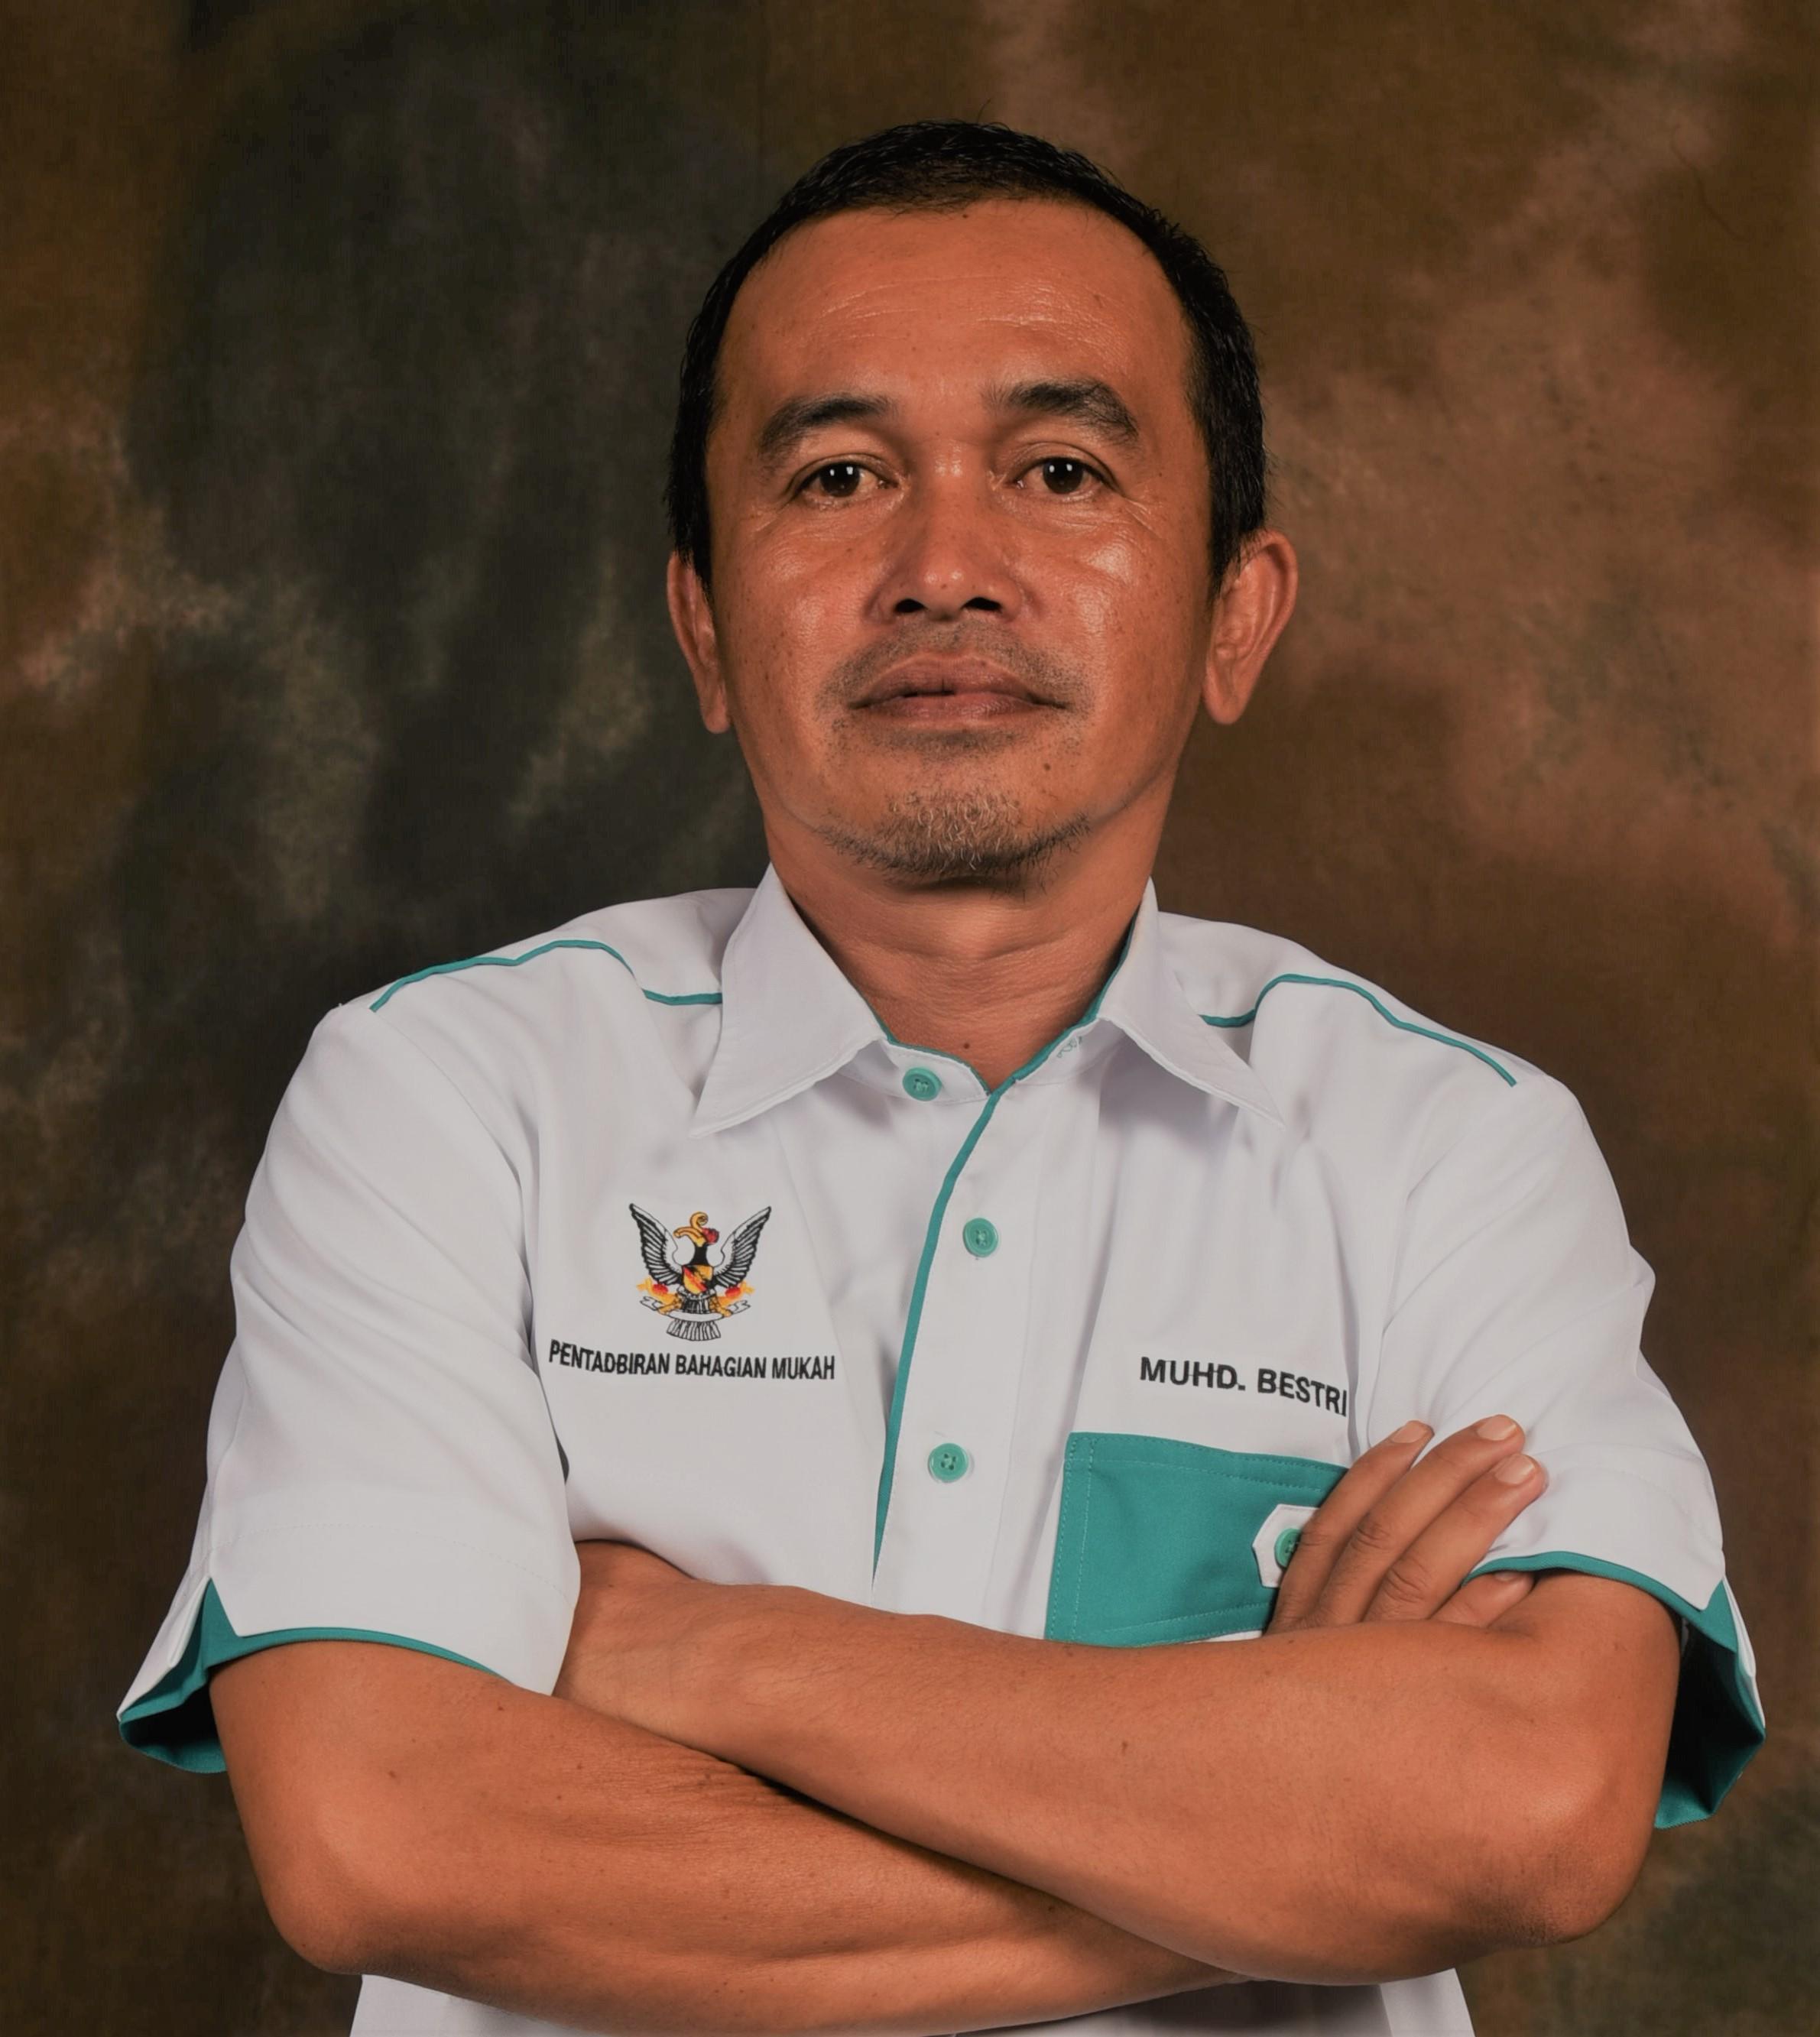 Mohd Bestri Bin Sahari